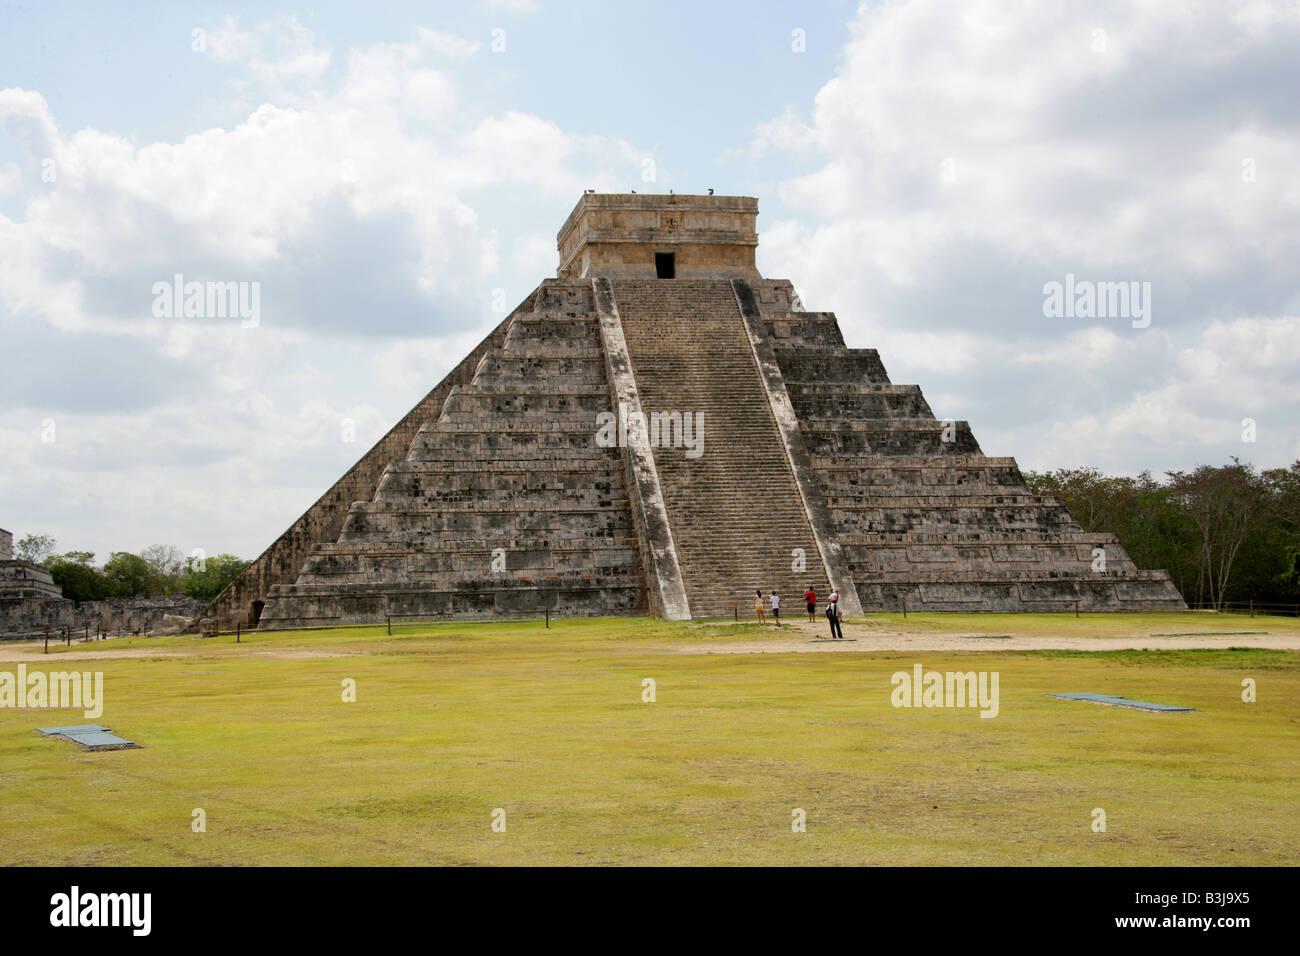 The Castle Pyramid (El Castillo Pyramid) or Temple of Kukulcan, Chichen Itza Archaeological Site, Chichen Itza, Stock Photo